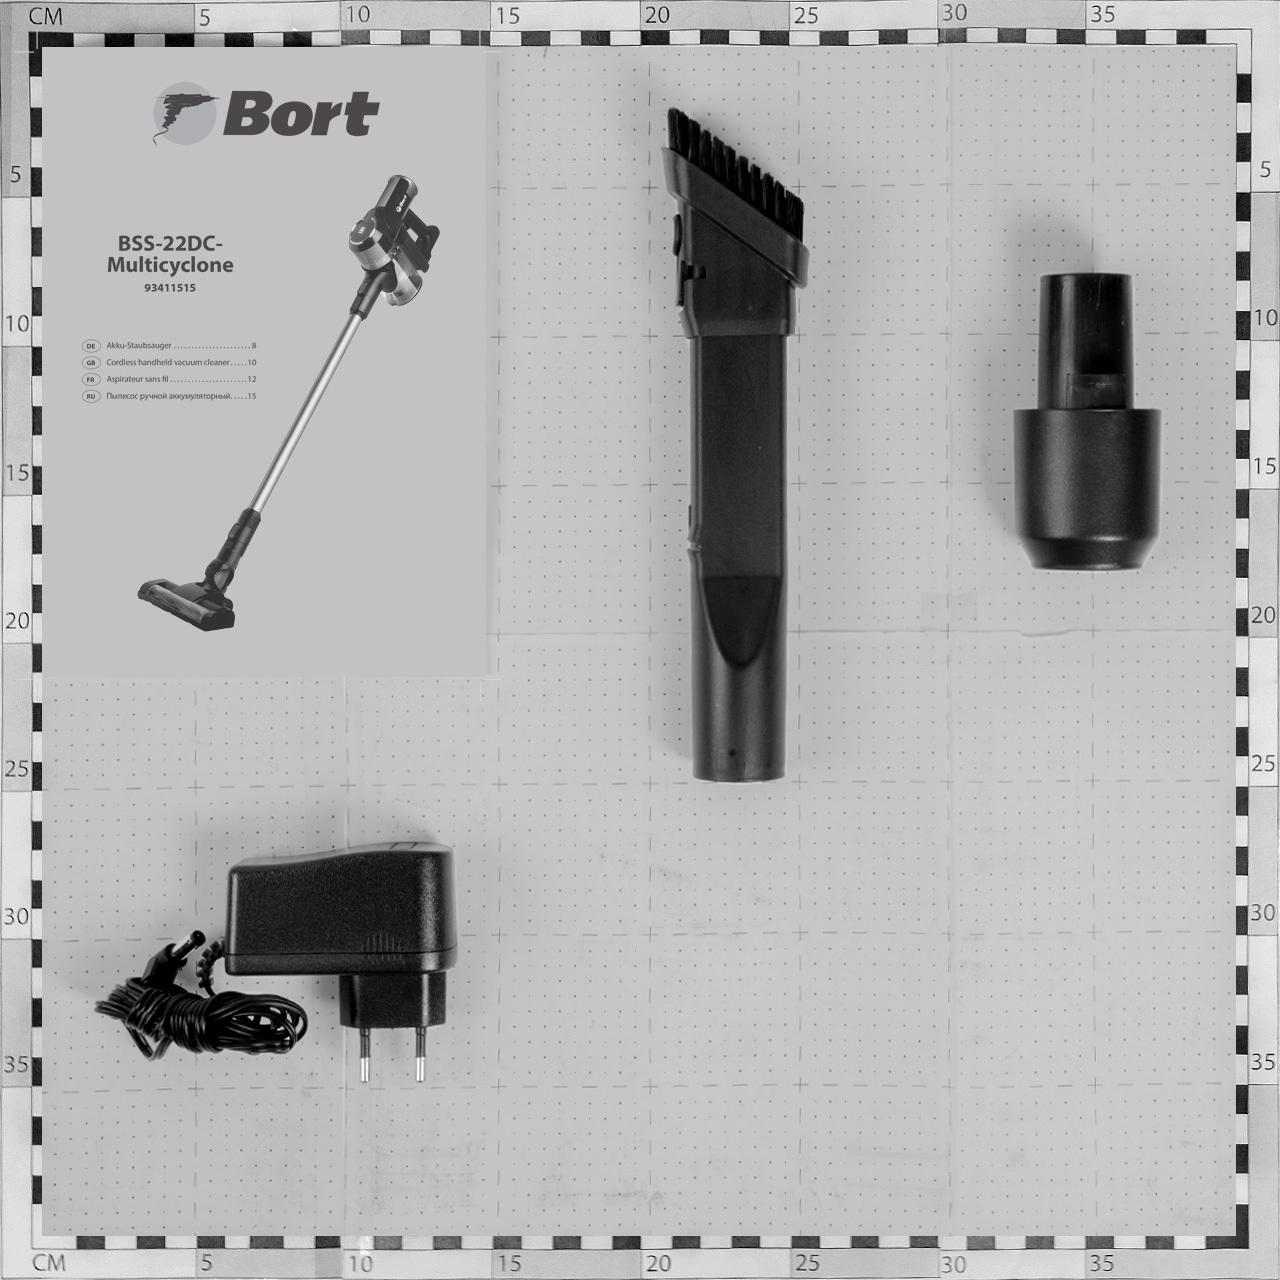 Aspiradora inalámbrica BORT BSS-22DC-Multicyclone